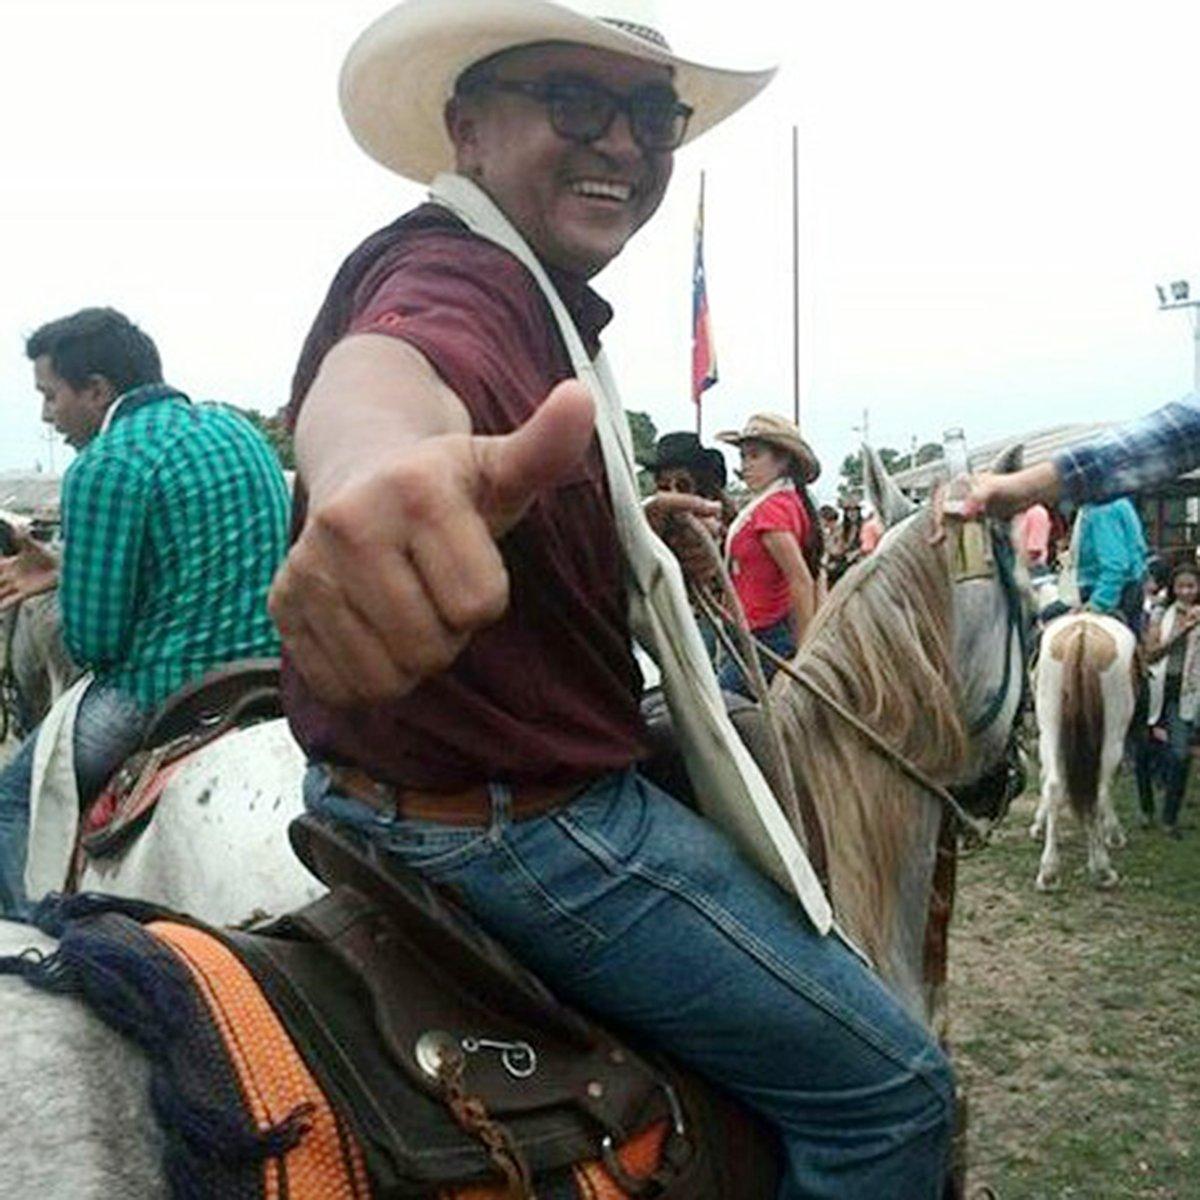 Siempre con una sonrisa maestro Jorge Guerrero #cabalgata #caballos #elorza2017 #lomascriollitodelmapa #lavozdeljoropo<br>http://pic.twitter.com/yB6dnghrPv